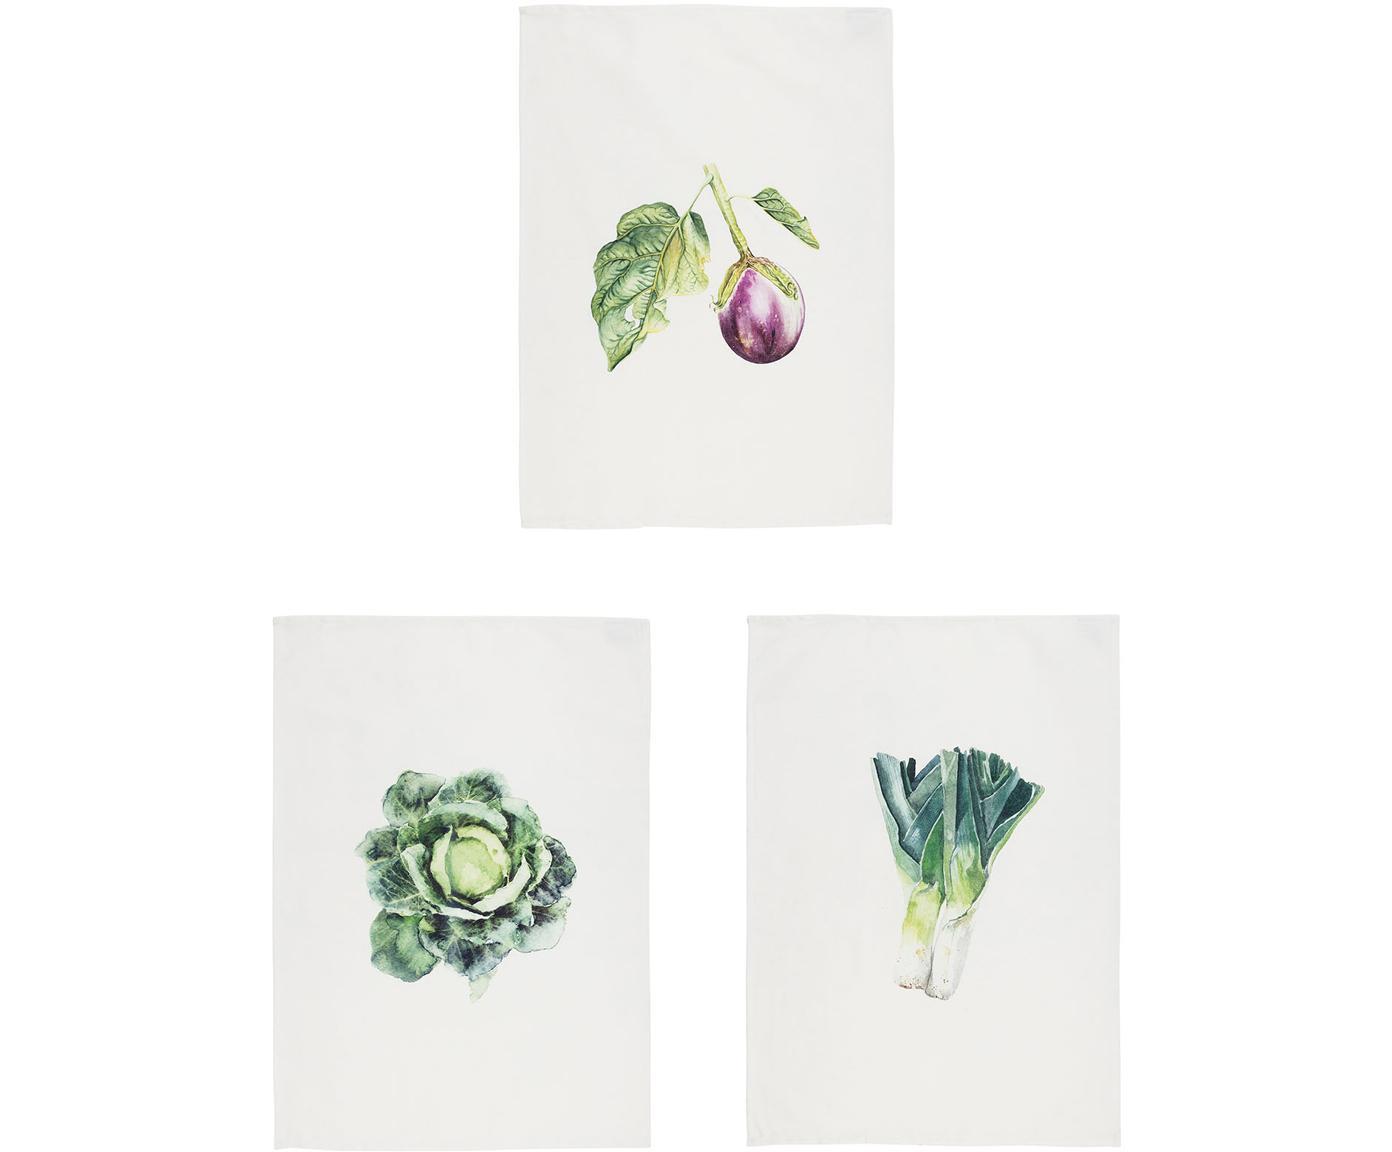 Geschirrtücher-Set Primeur, 3-tlg., Baumwolle, Weiß, Grün, 50 x 70 cm